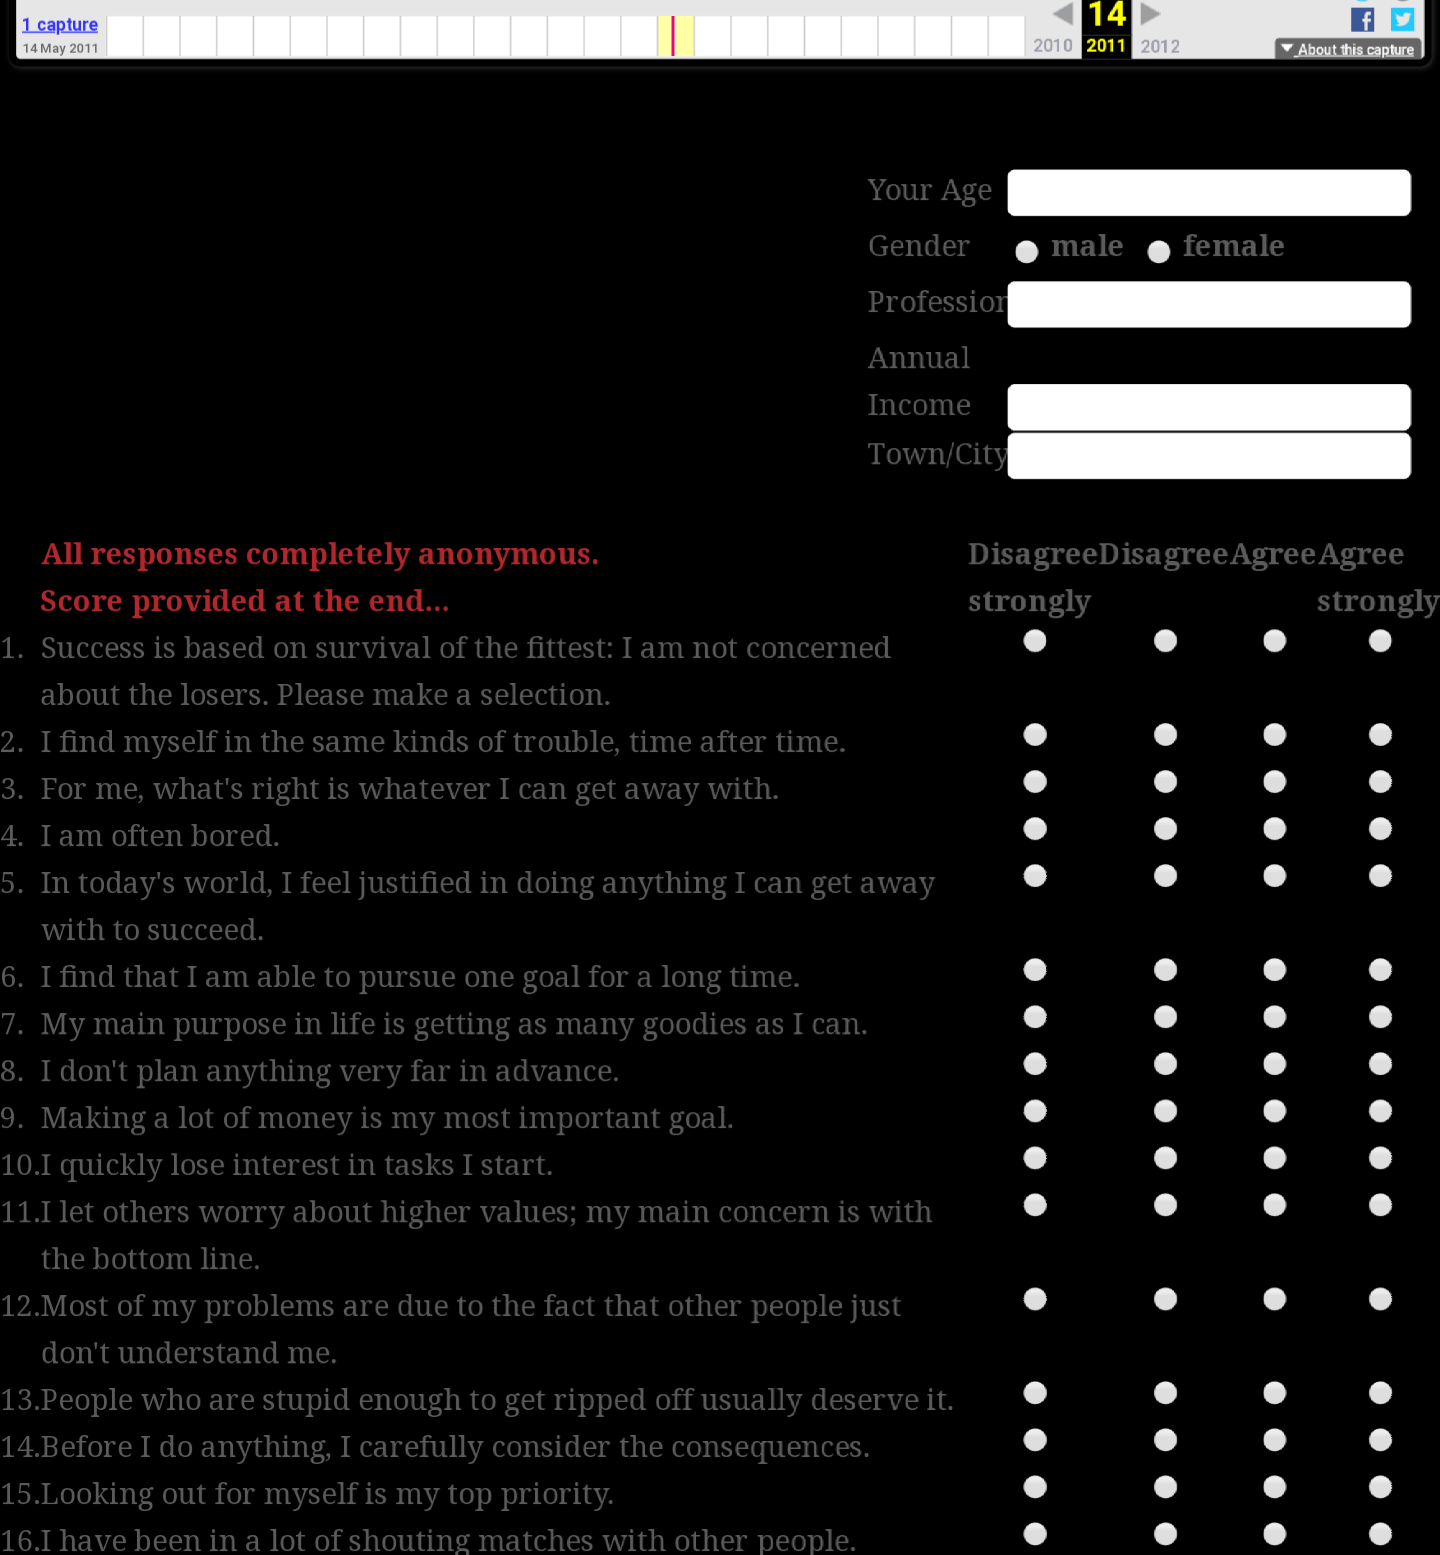 snapshot of the great British psychopath survey